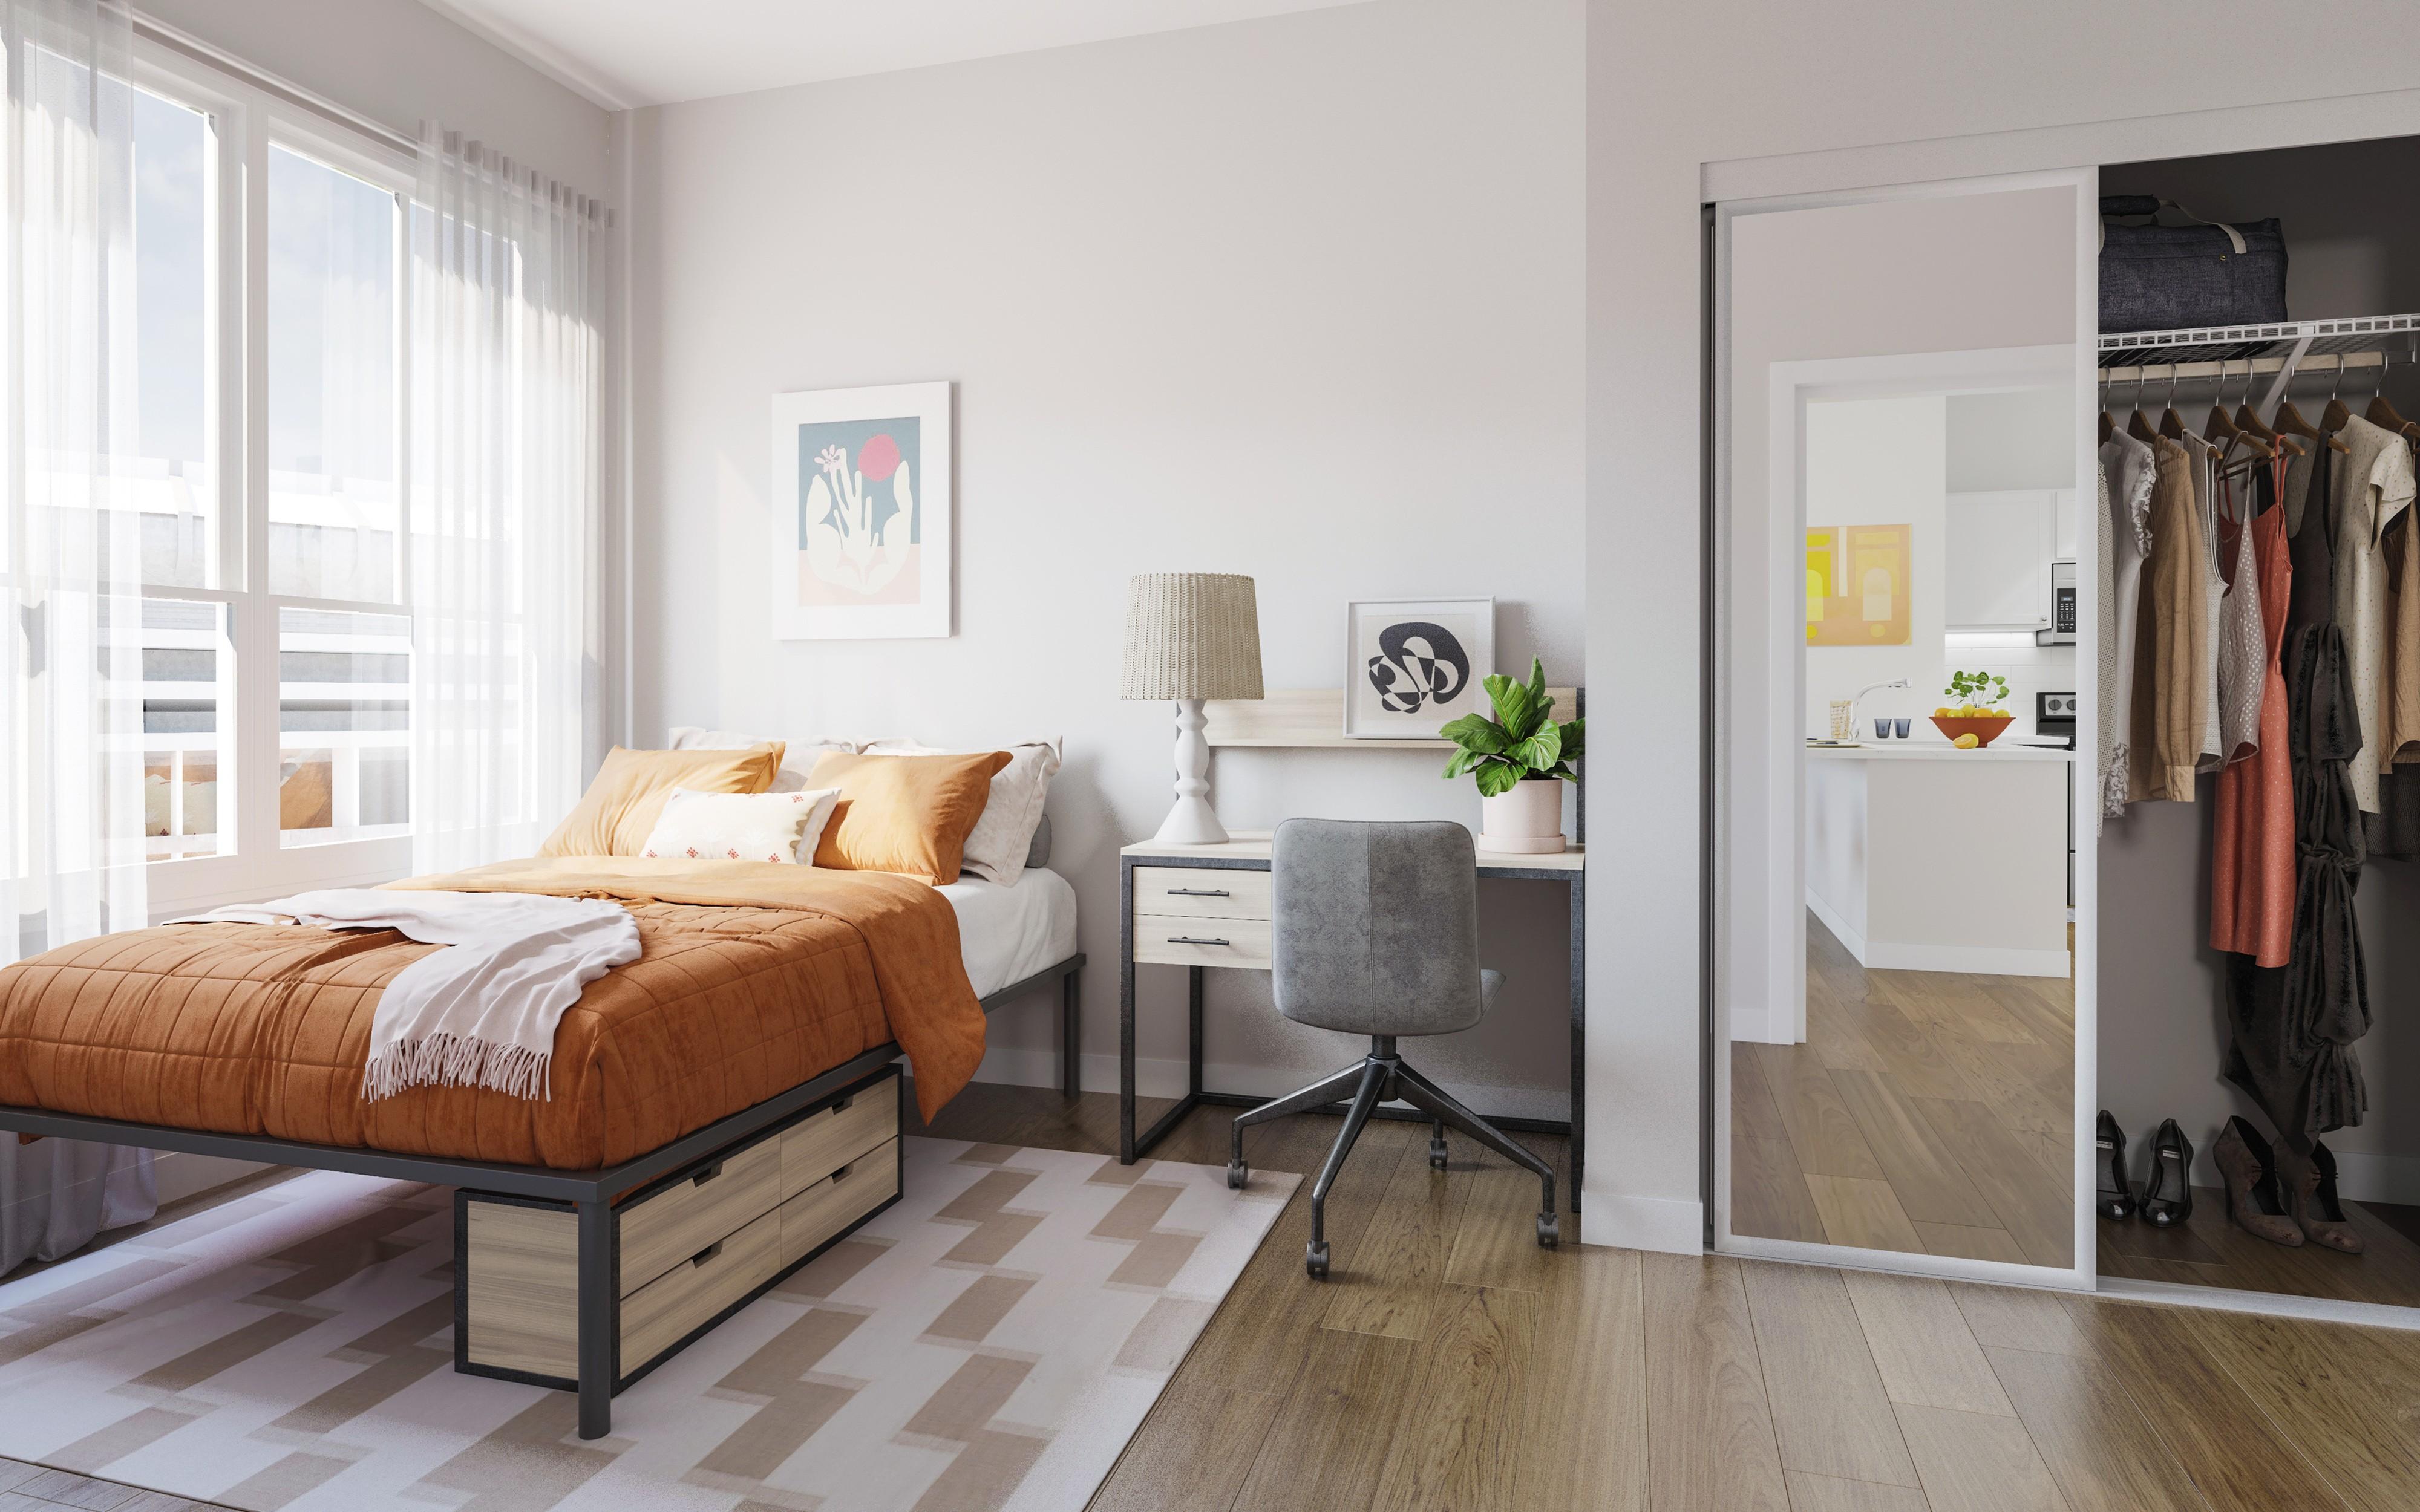 Student Housing Coming 2021 - HERE Tuscaloosa